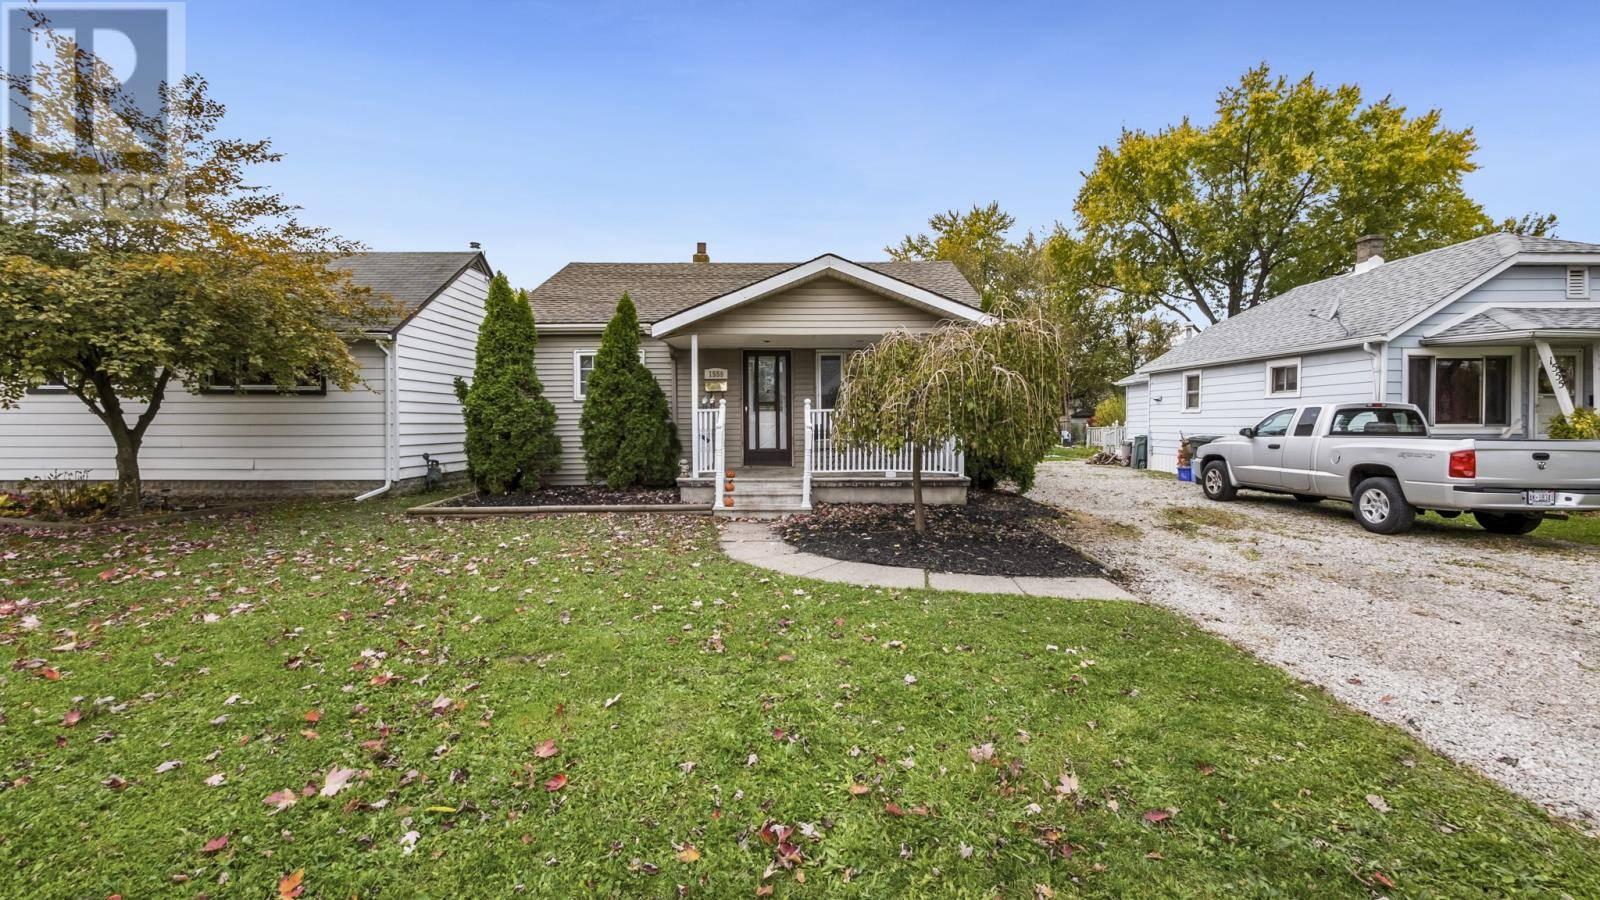 House for sale at 1559 Buckingham  Windsor Ontario - MLS: 19027826